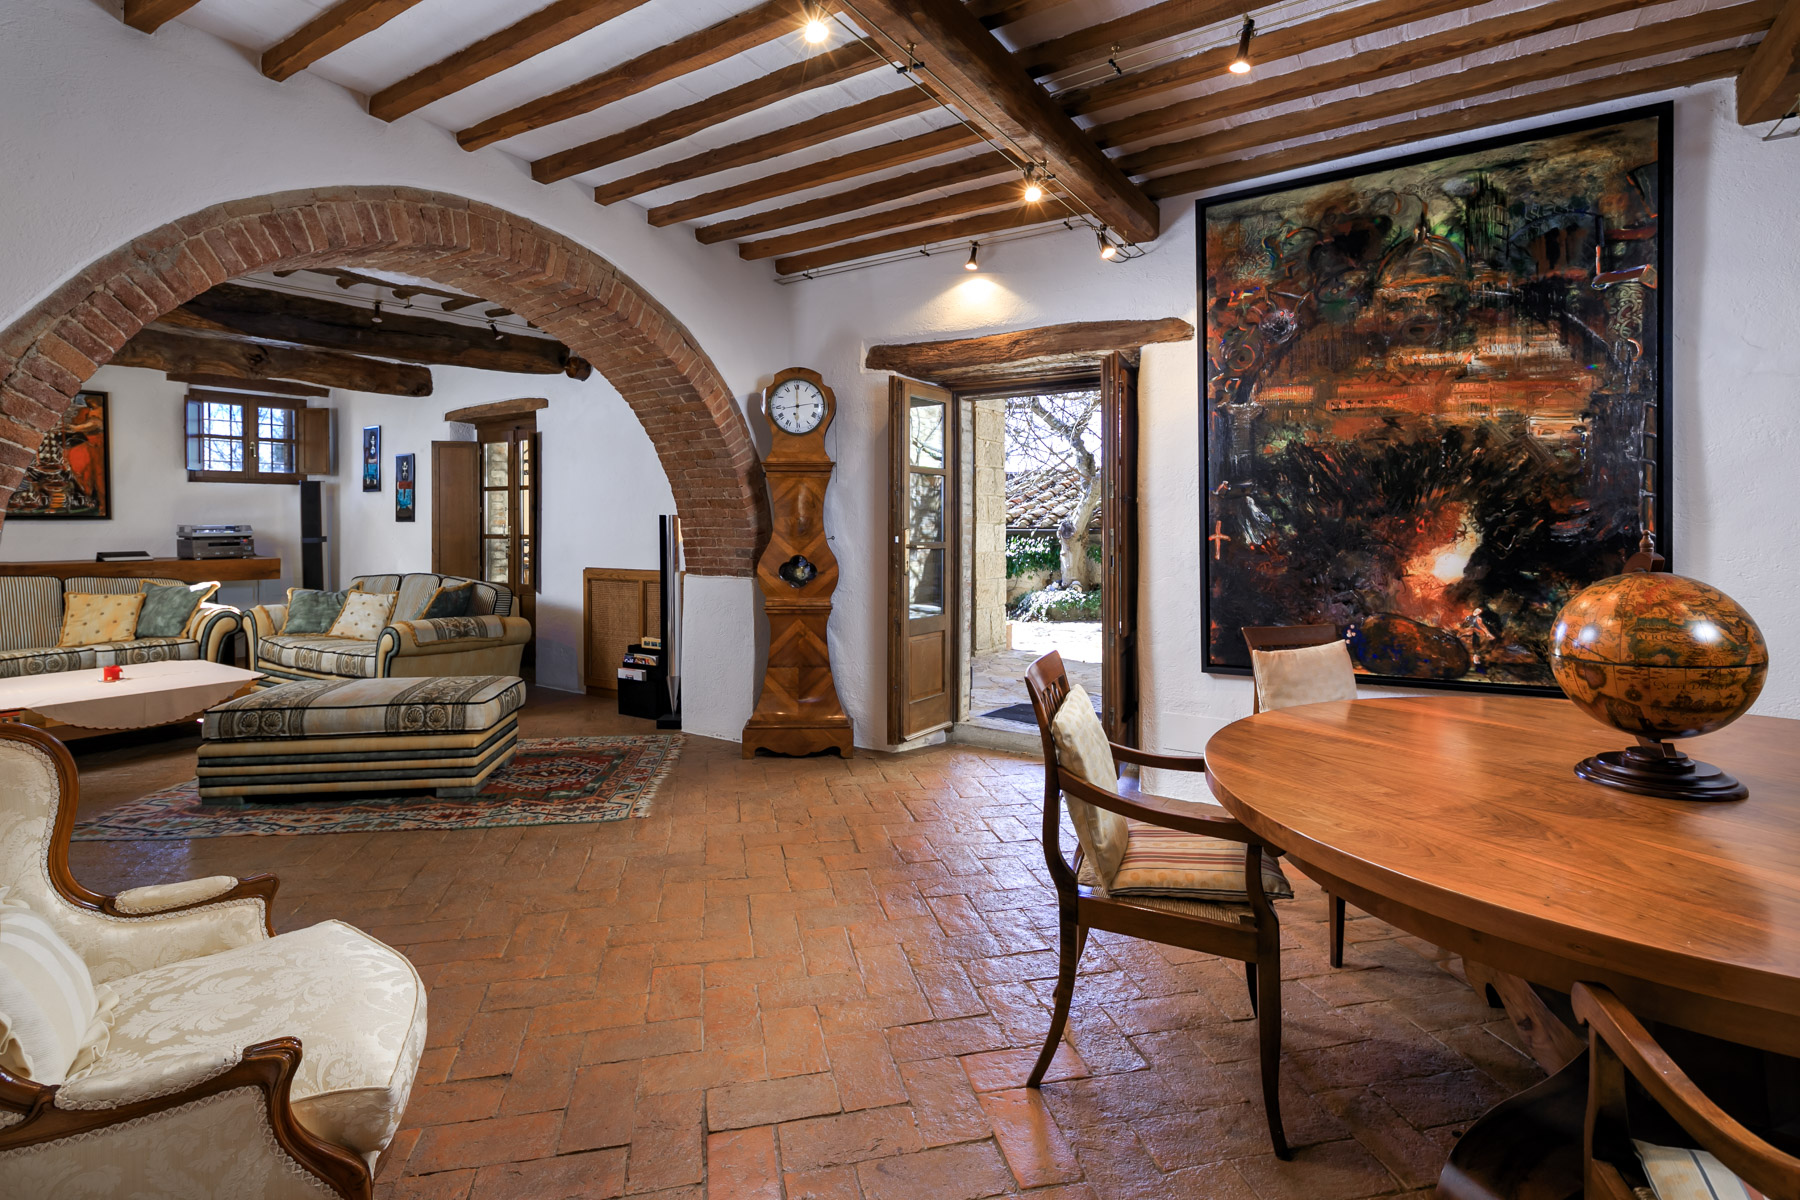 Villa in Vendita a Gaiole In Chianti: 5 locali, 465 mq - Foto 20